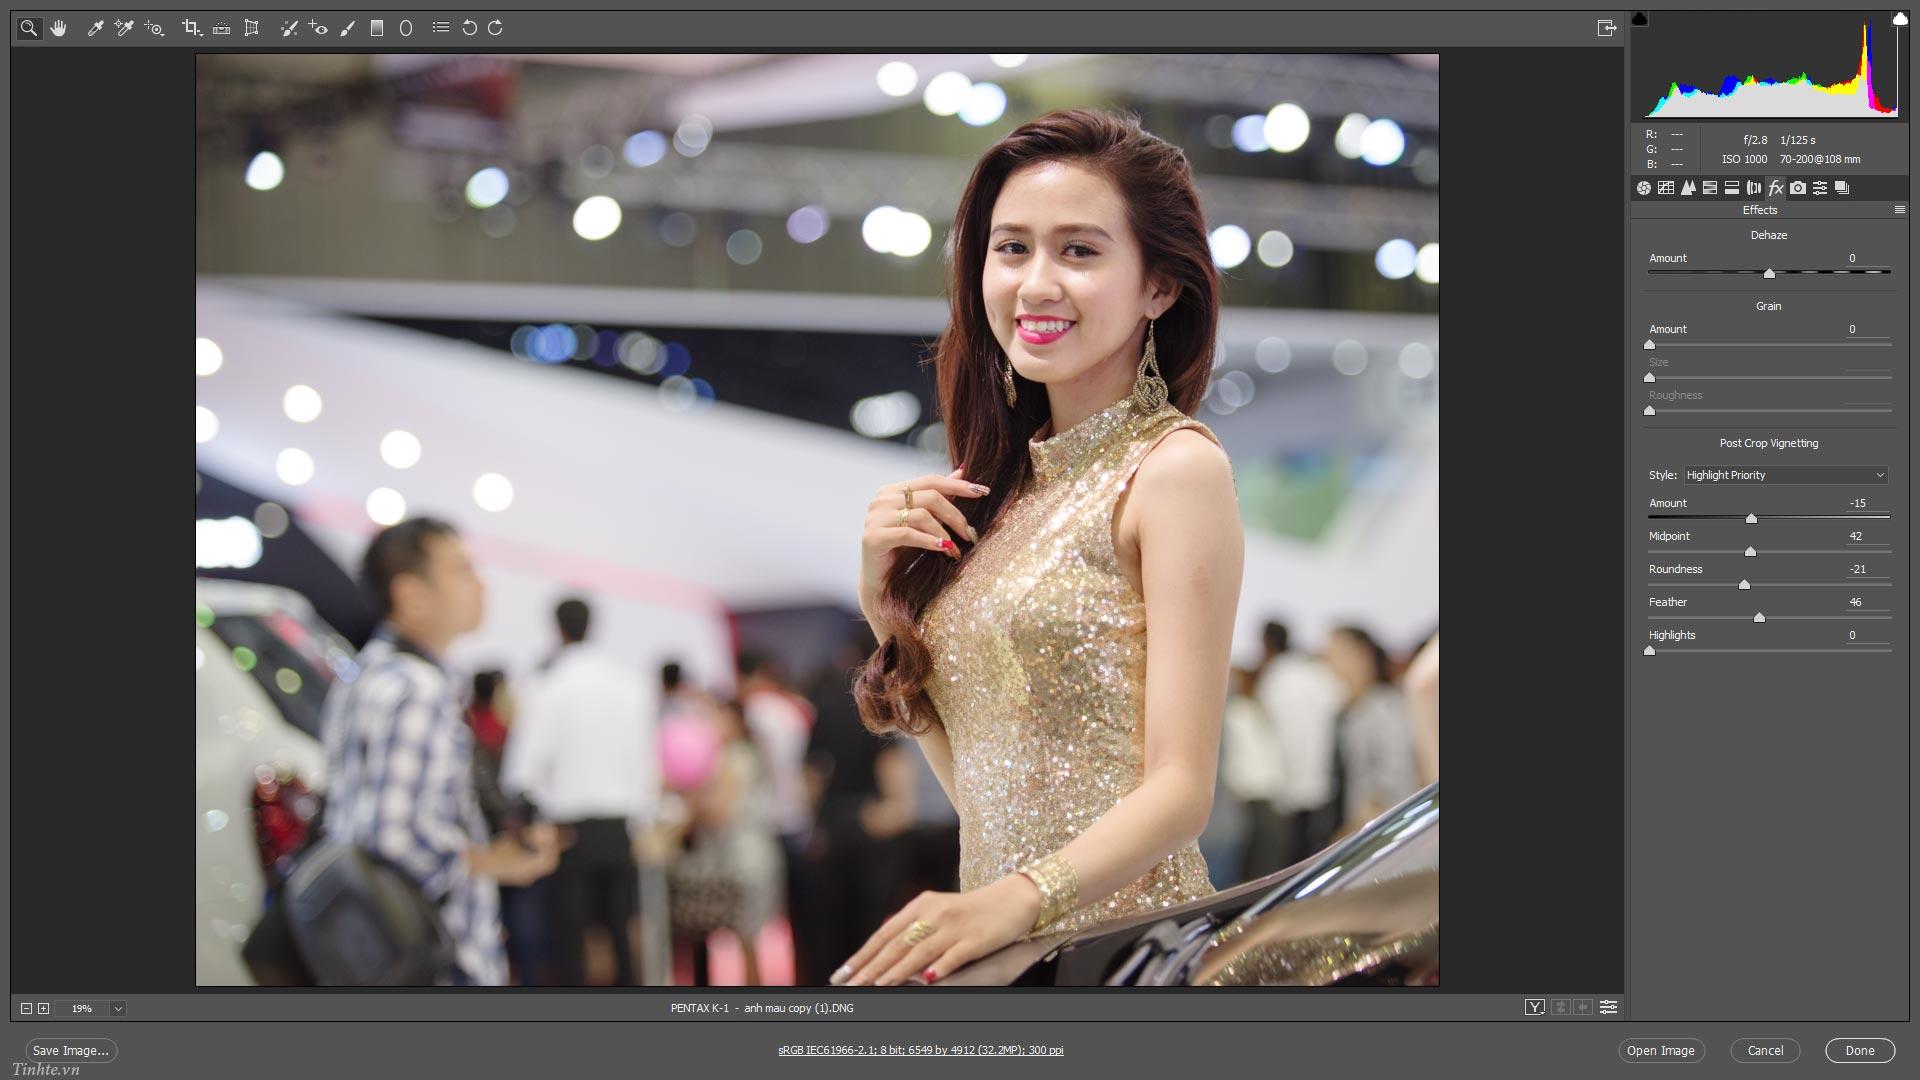 Lam_anh_sang_ro_trong_treo_hon_tinhte.vn_04.jpg